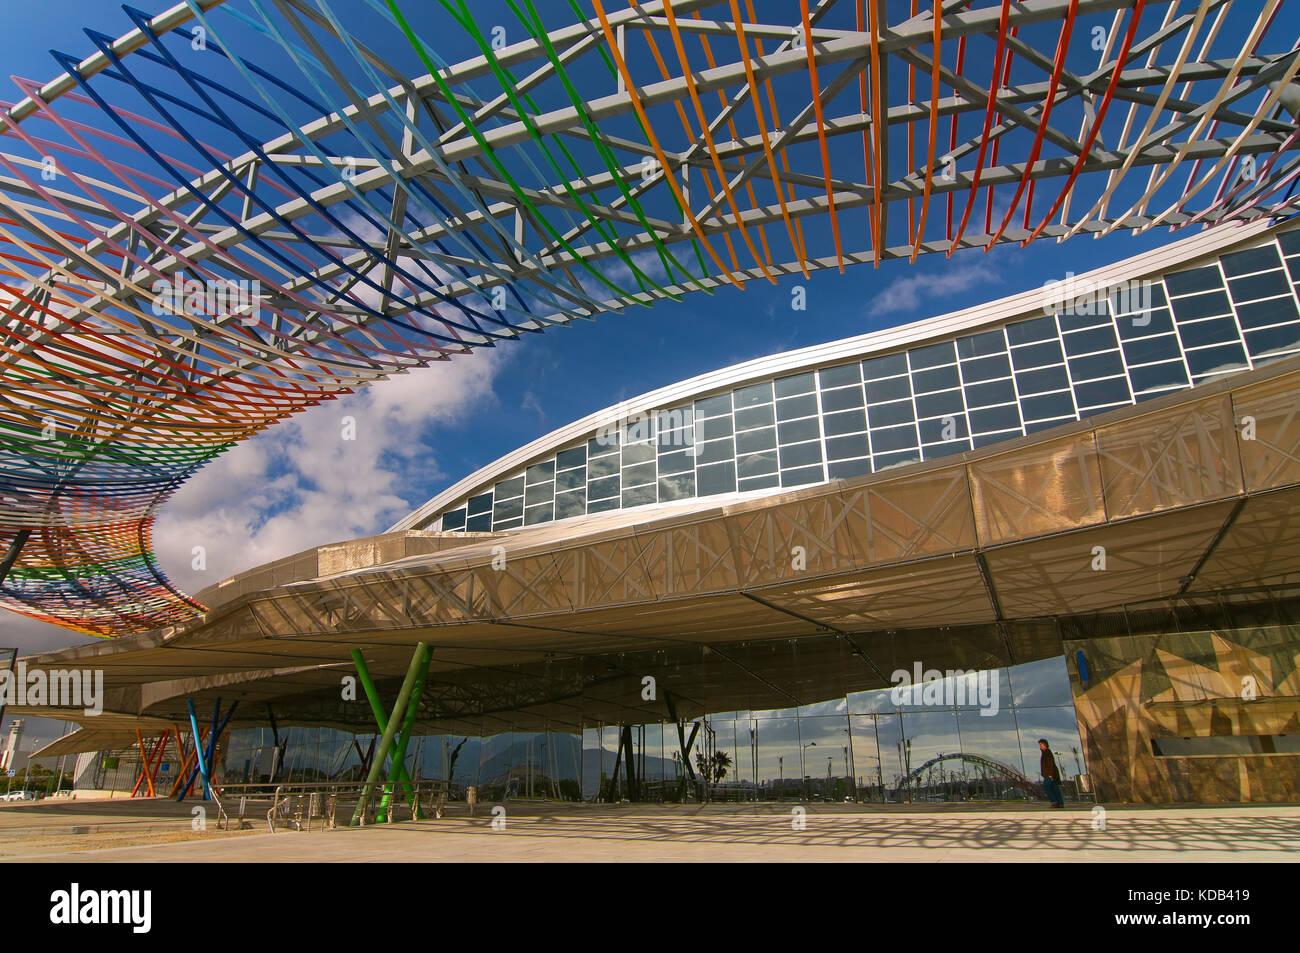 Trade Fairs and Congress Center, Malaga, Region of Andalusia, Spain, Europe - Stock Image